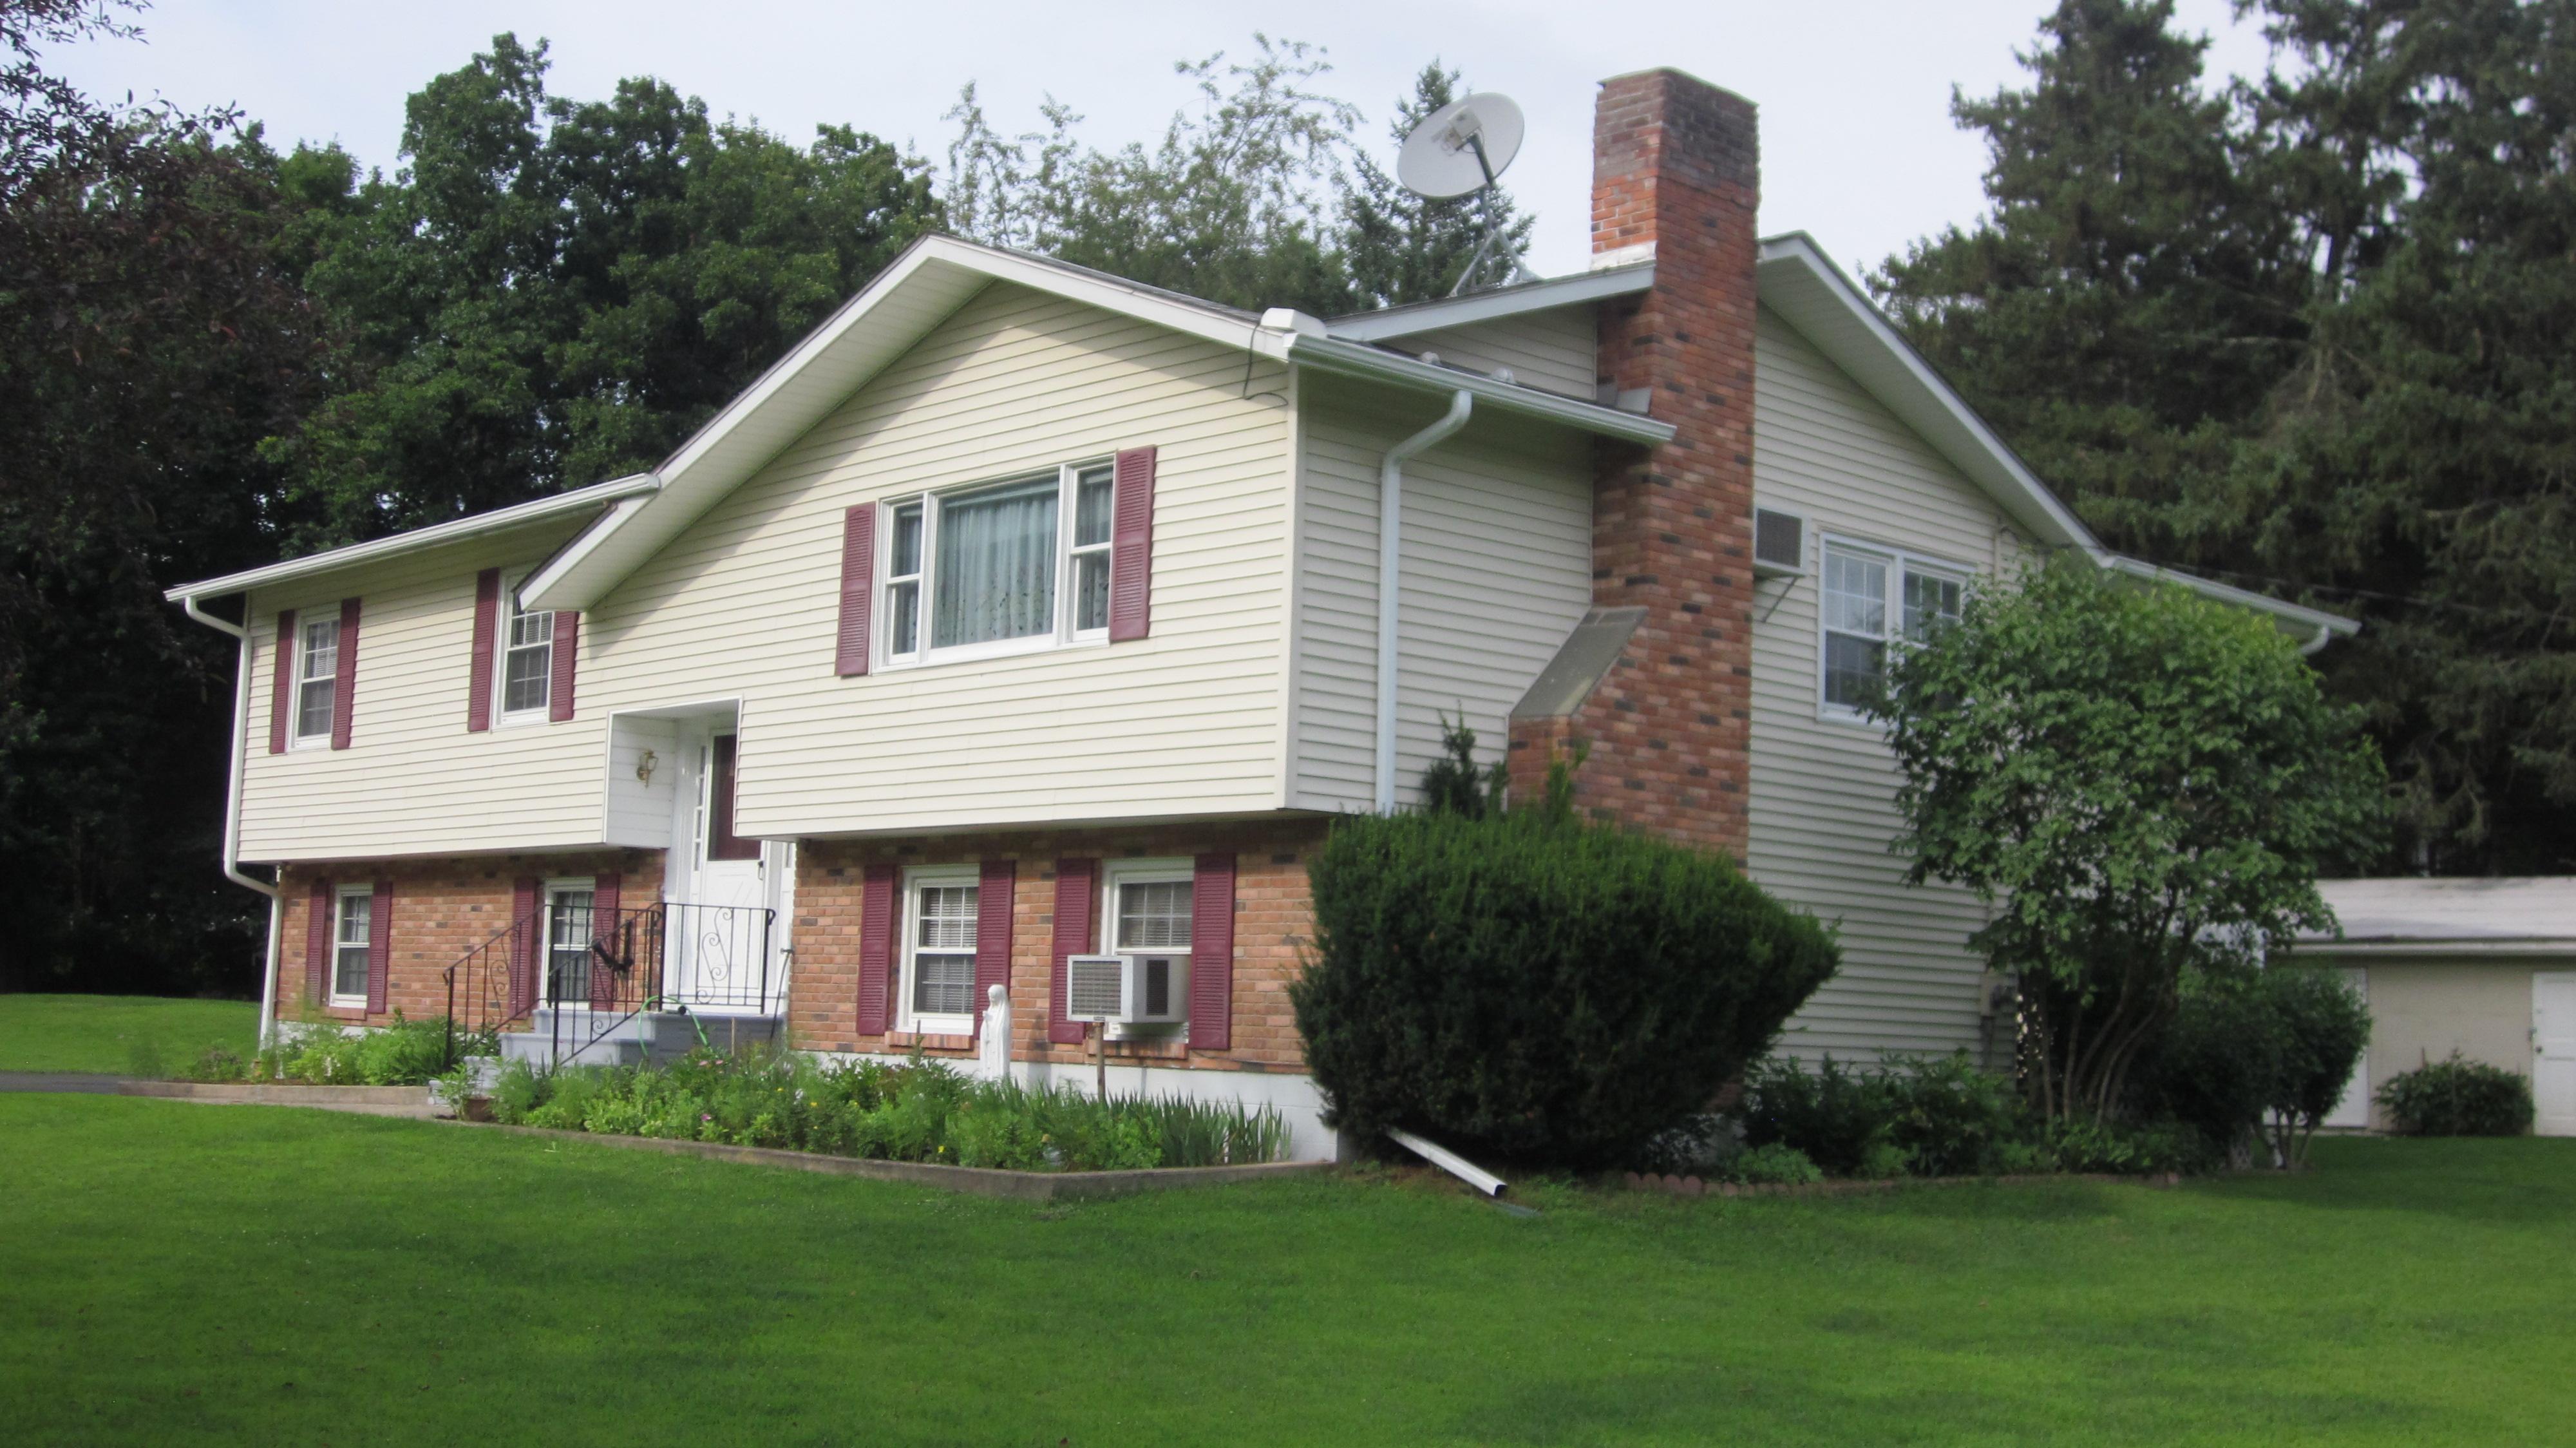 Casa para uma família para Venda às Meticulous Raised Ranch 23 Tamanny Trail Danbury, Connecticut 06811 Estados Unidos